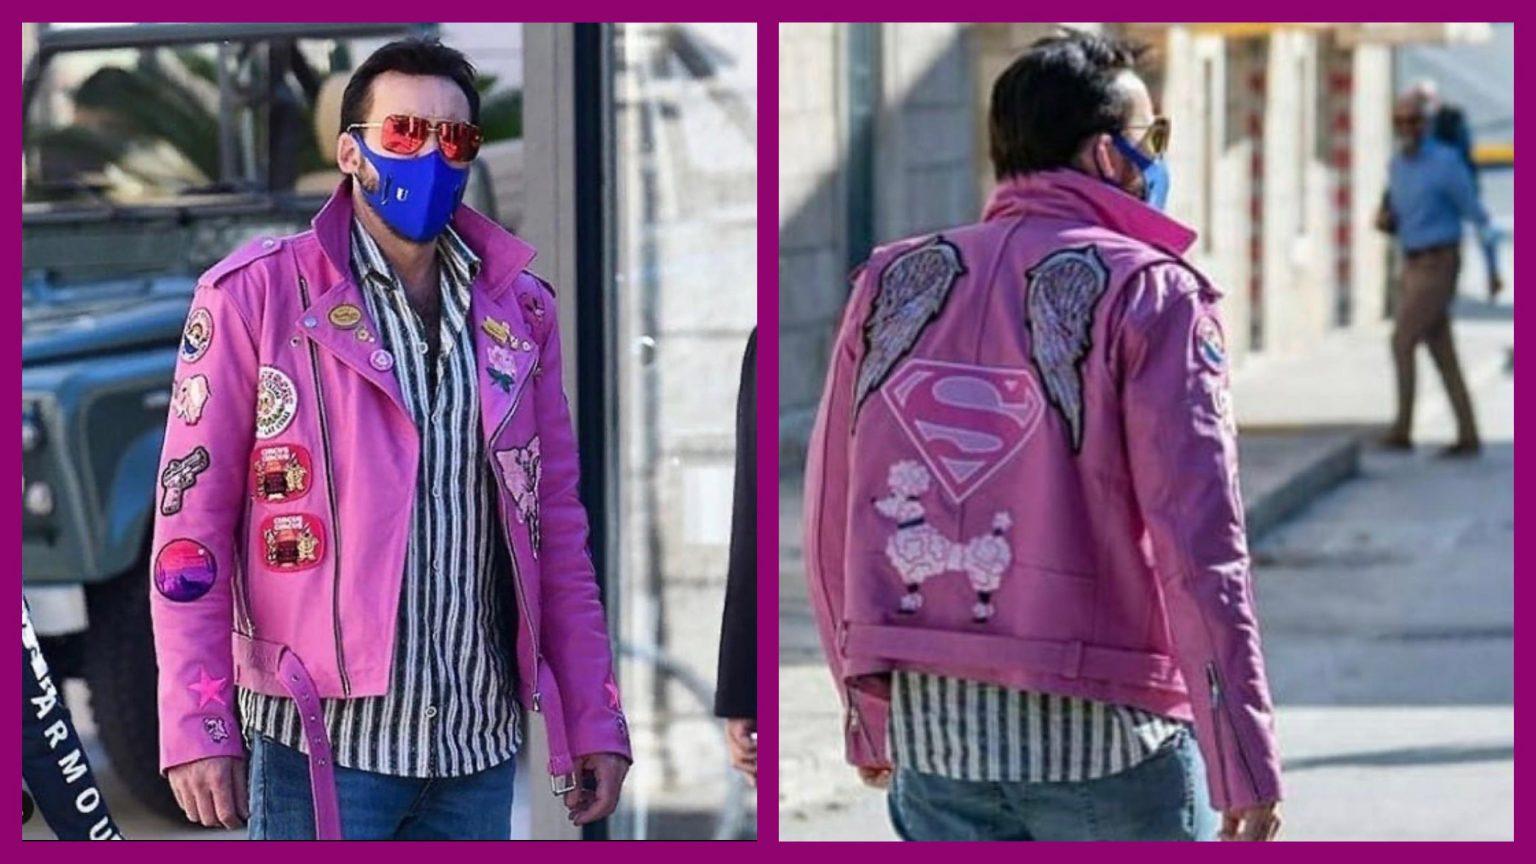 nic-cage-jacket-1536x864.jpg